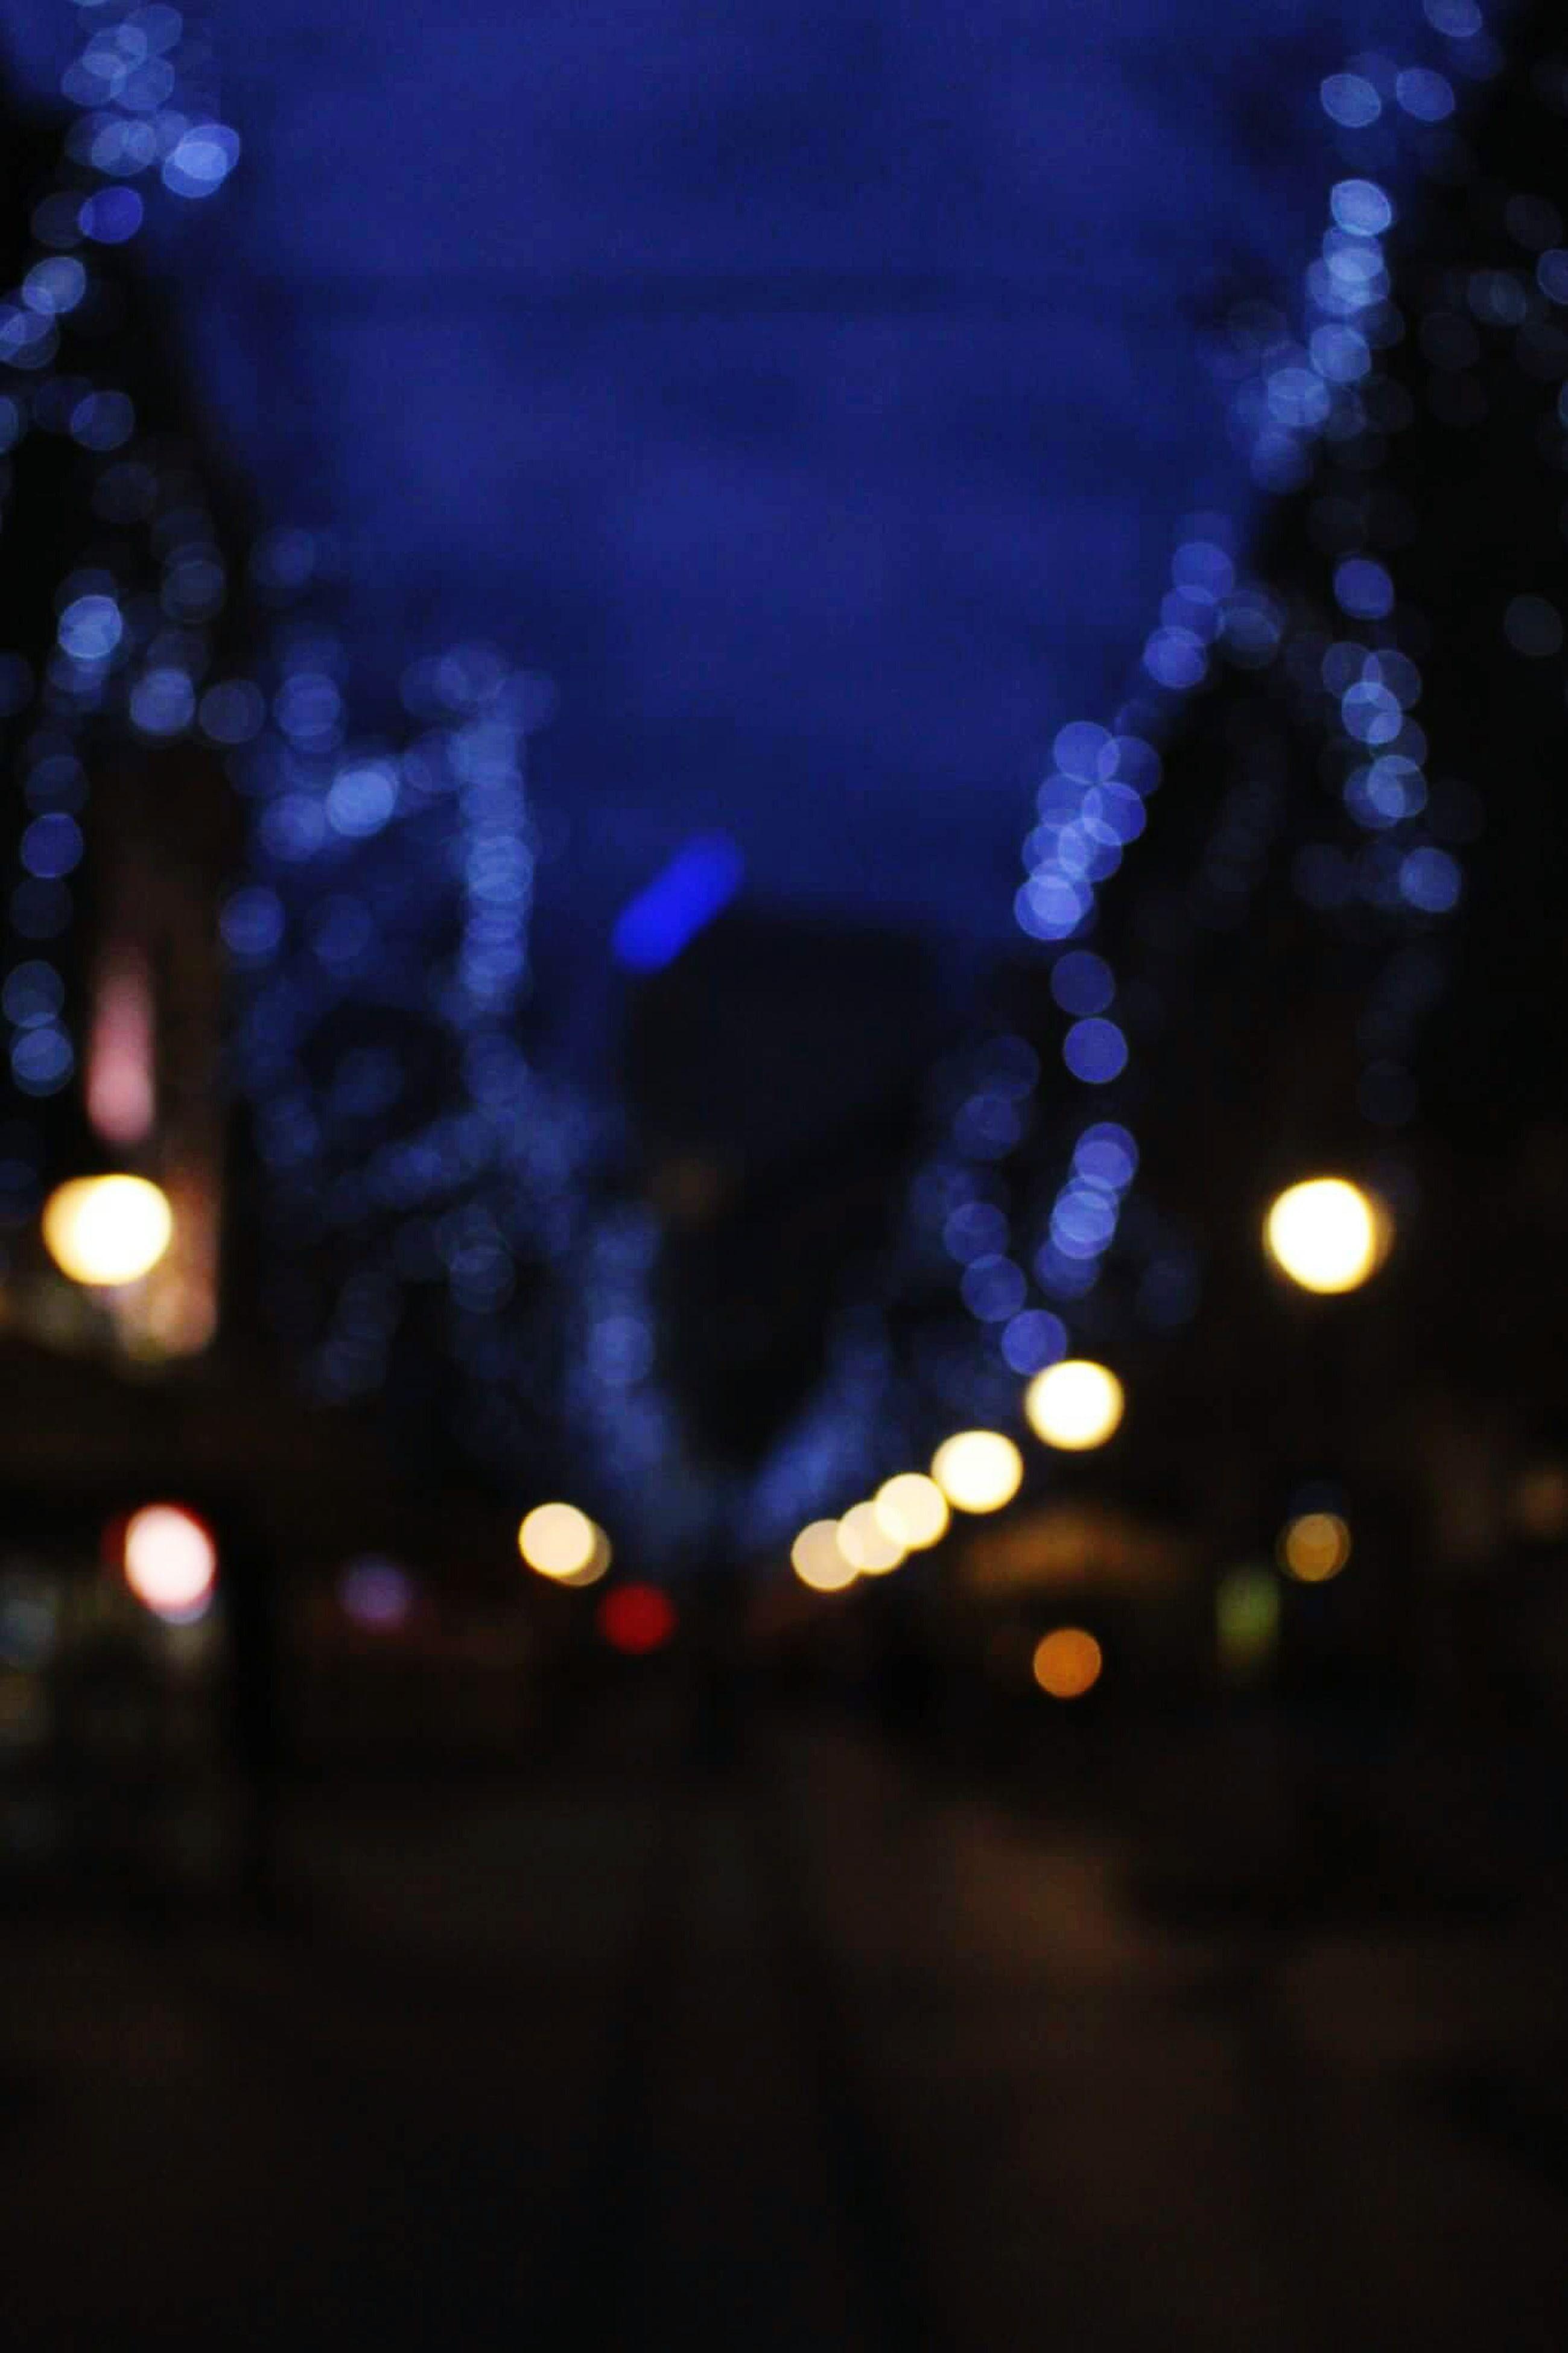 illuminated, night, defocused, lighting equipment, light - natural phenomenon, city, street, building exterior, glowing, street light, sky, no people, road, dusk, car, outdoors, architecture, transportation, water, light